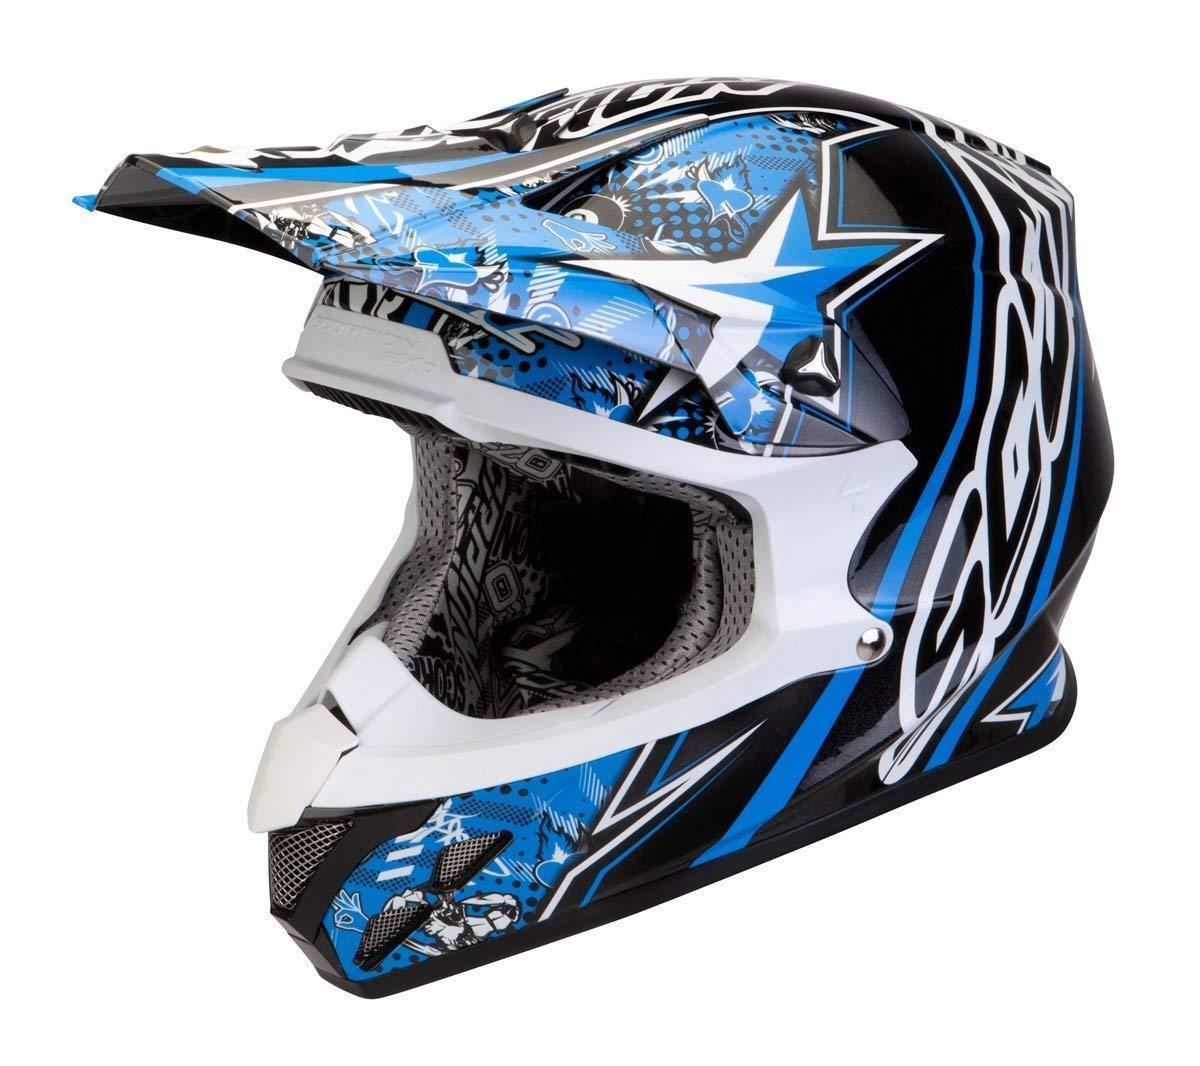 Scorpion VX-20 Air Win Win Crosshelm, schwarz-weiss-blau, Größe 2XL, schwarz-weiss-blau, Größe 2XL